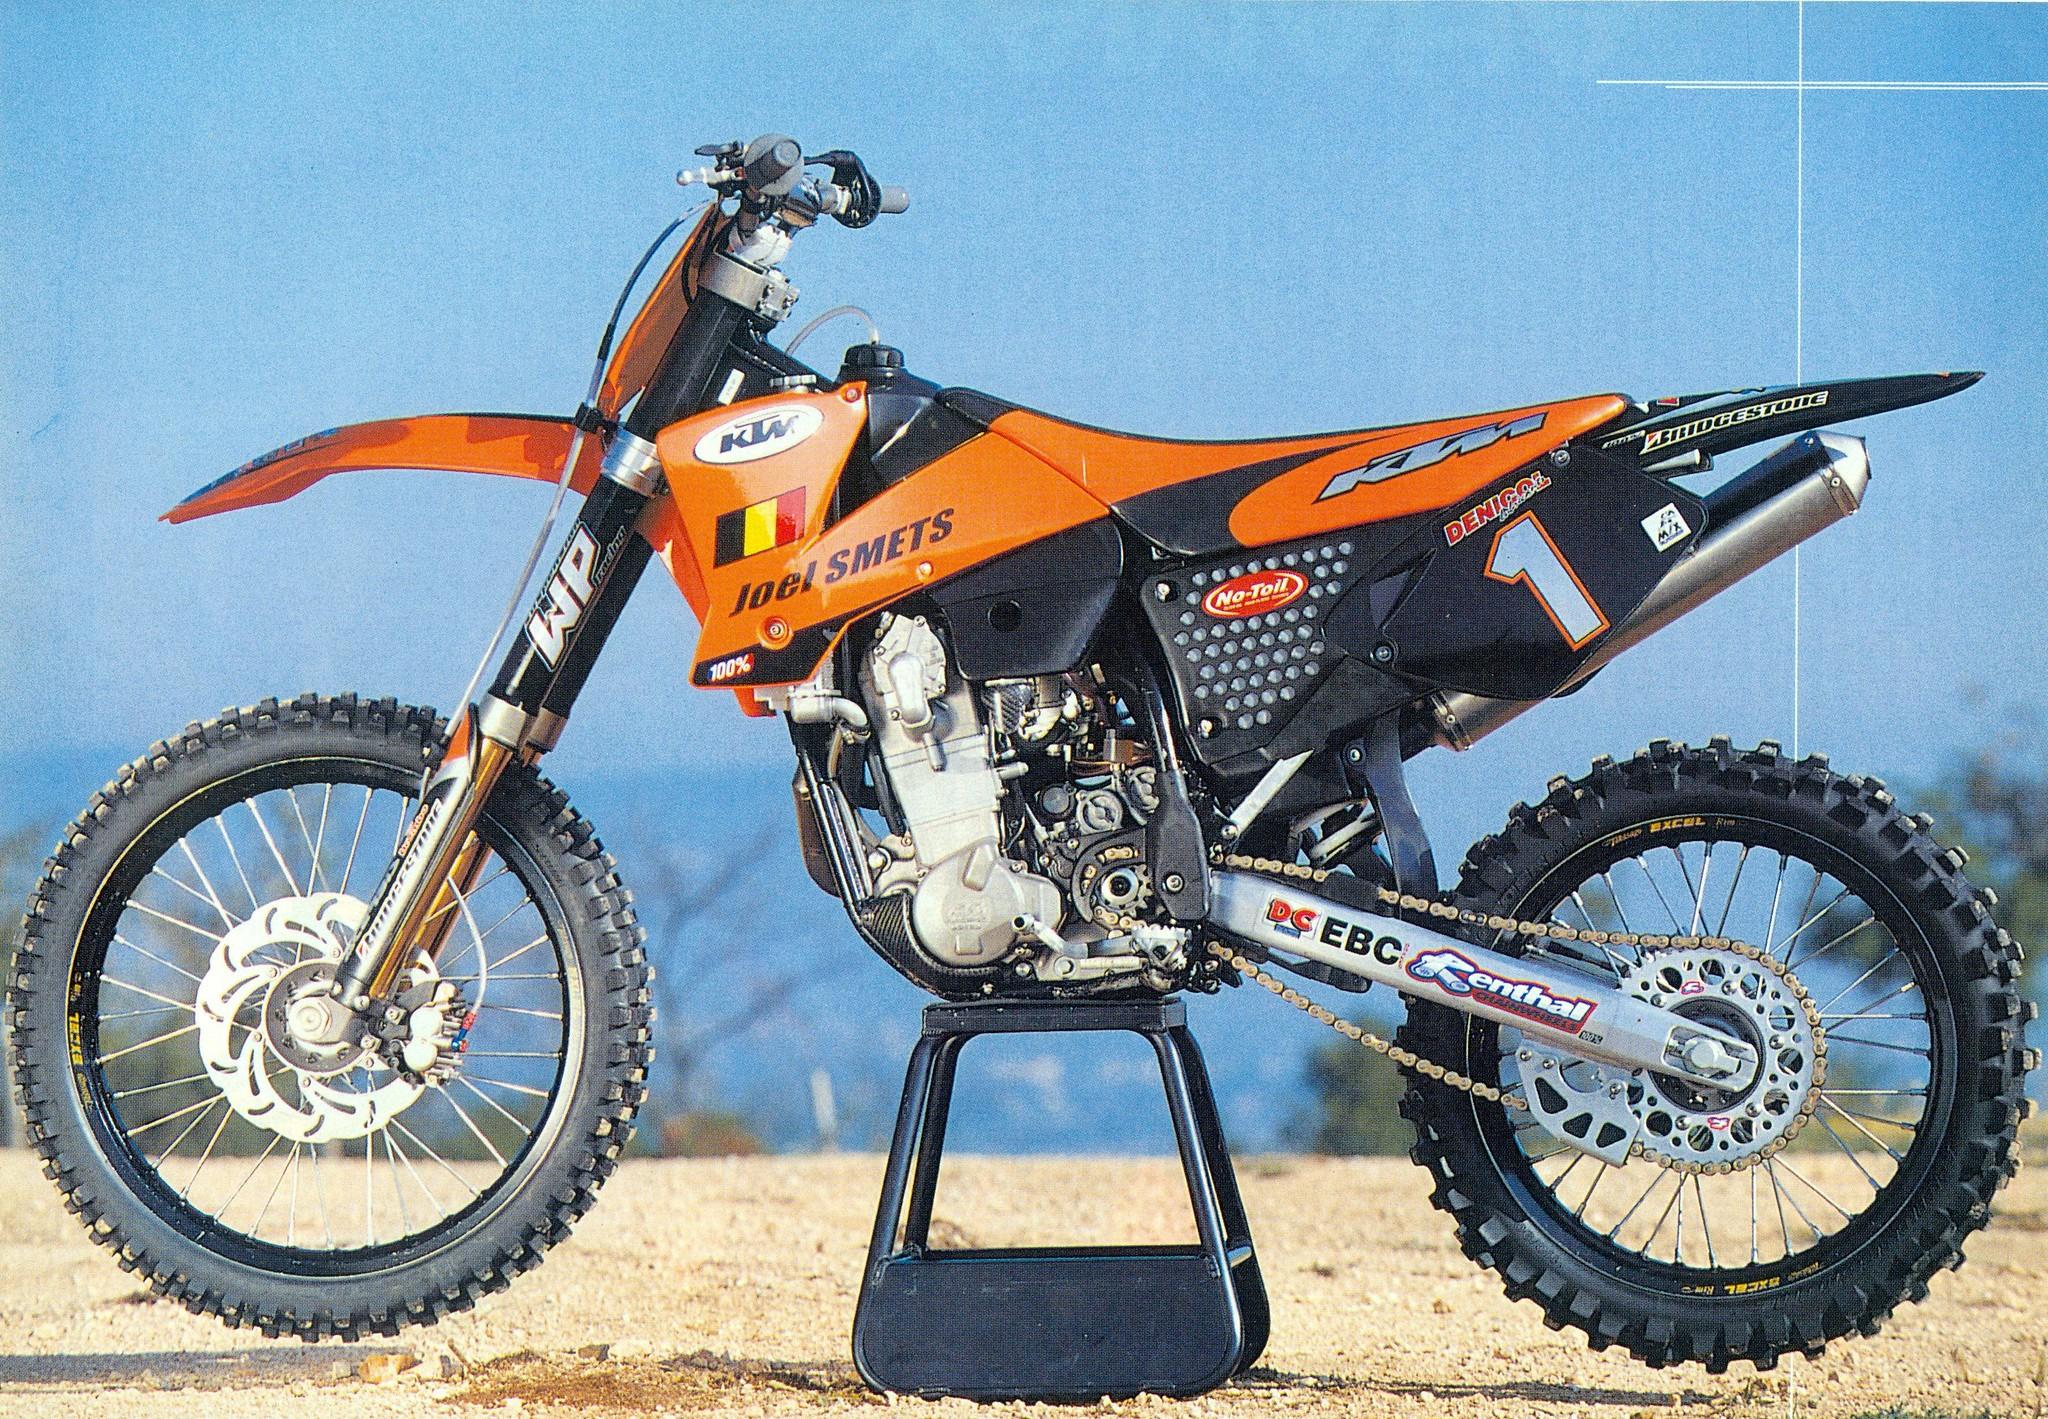 Joel Smets' 2001 works KTM540